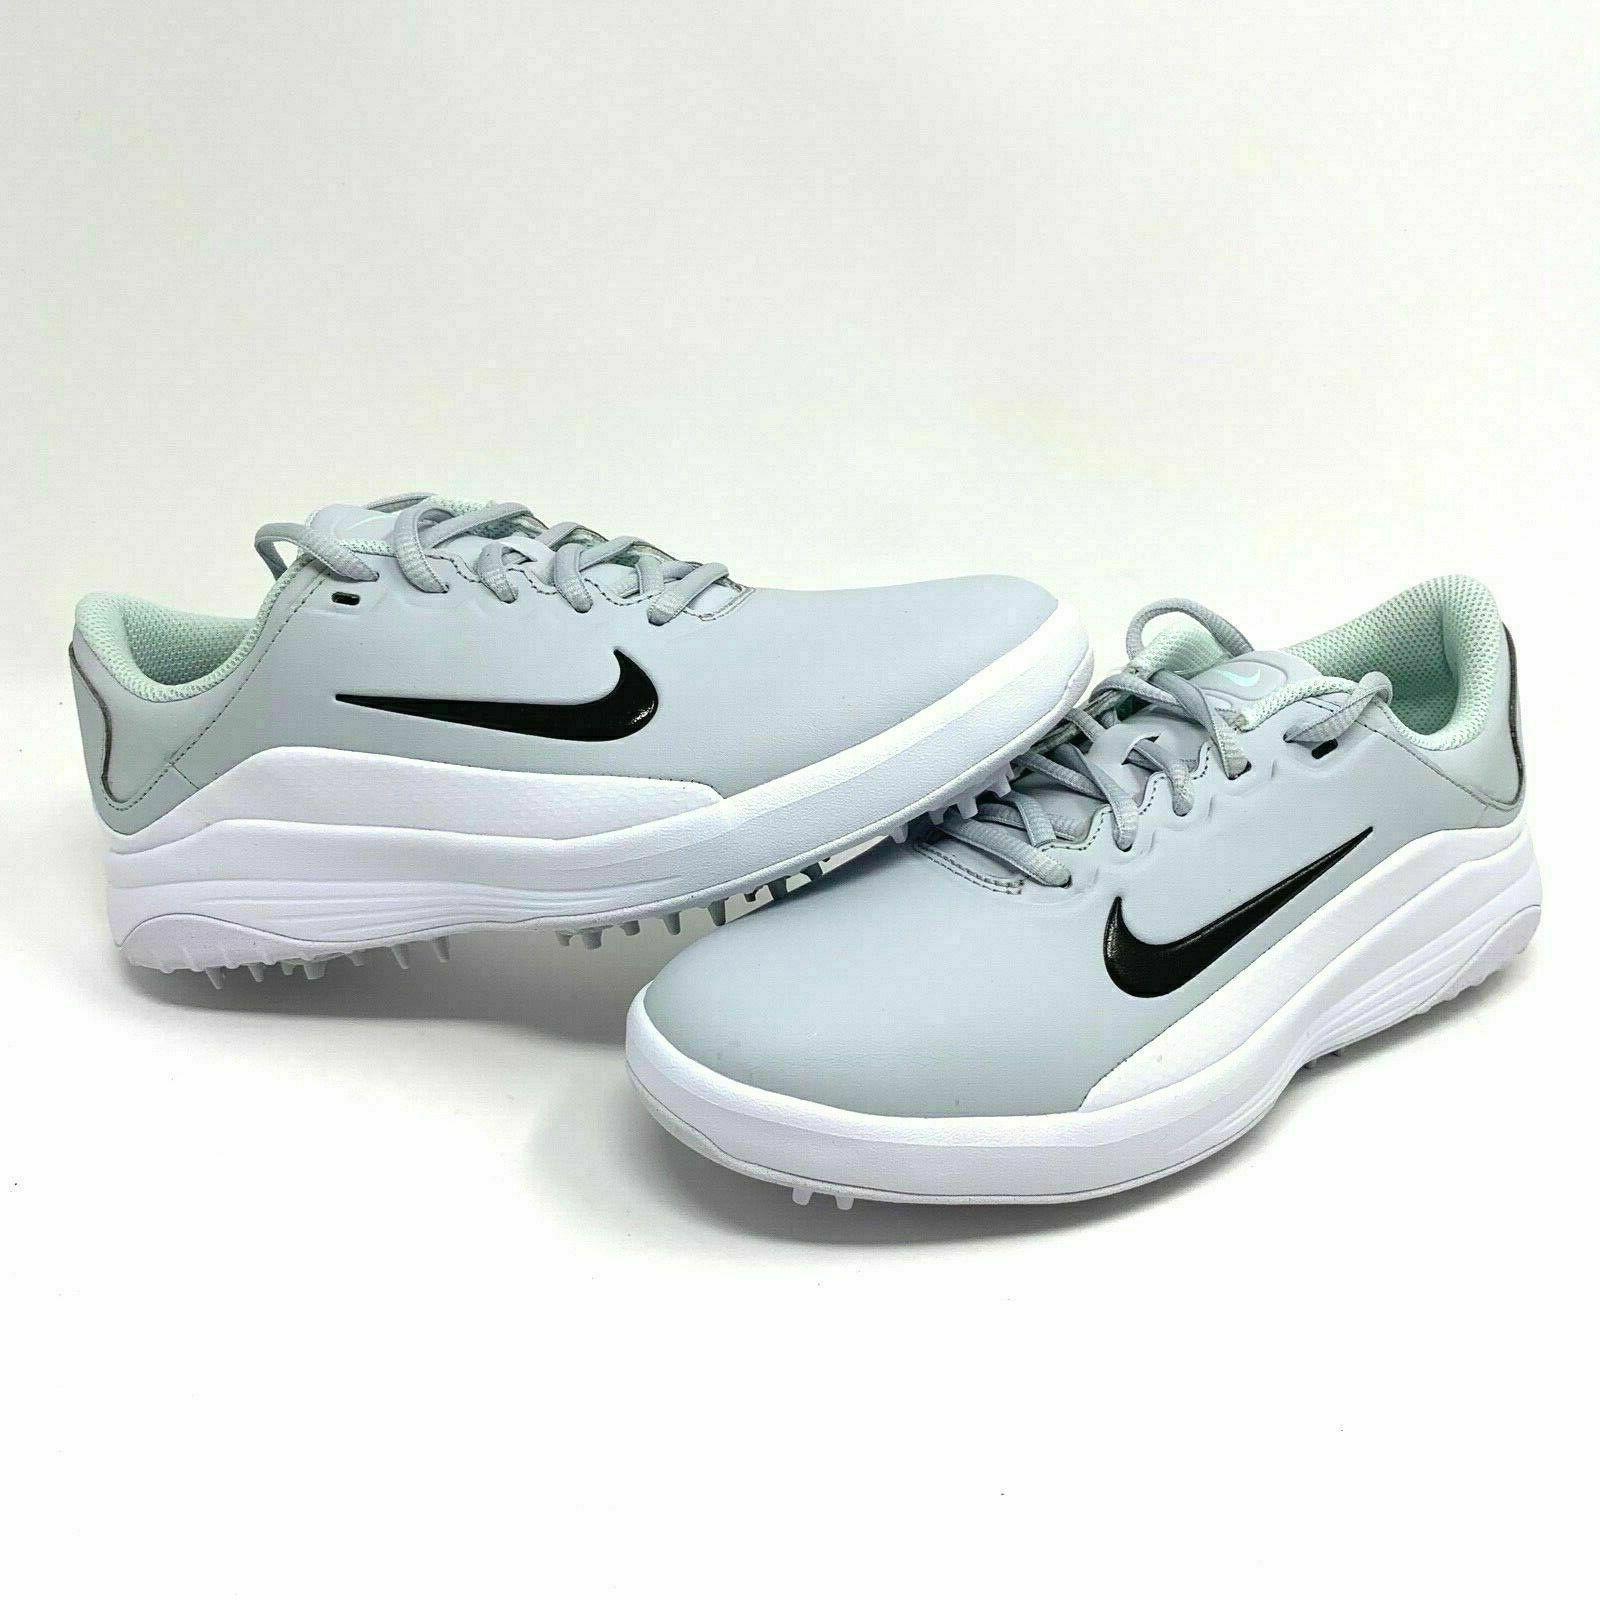 Nike Vapor Golf Shoes Pure - New